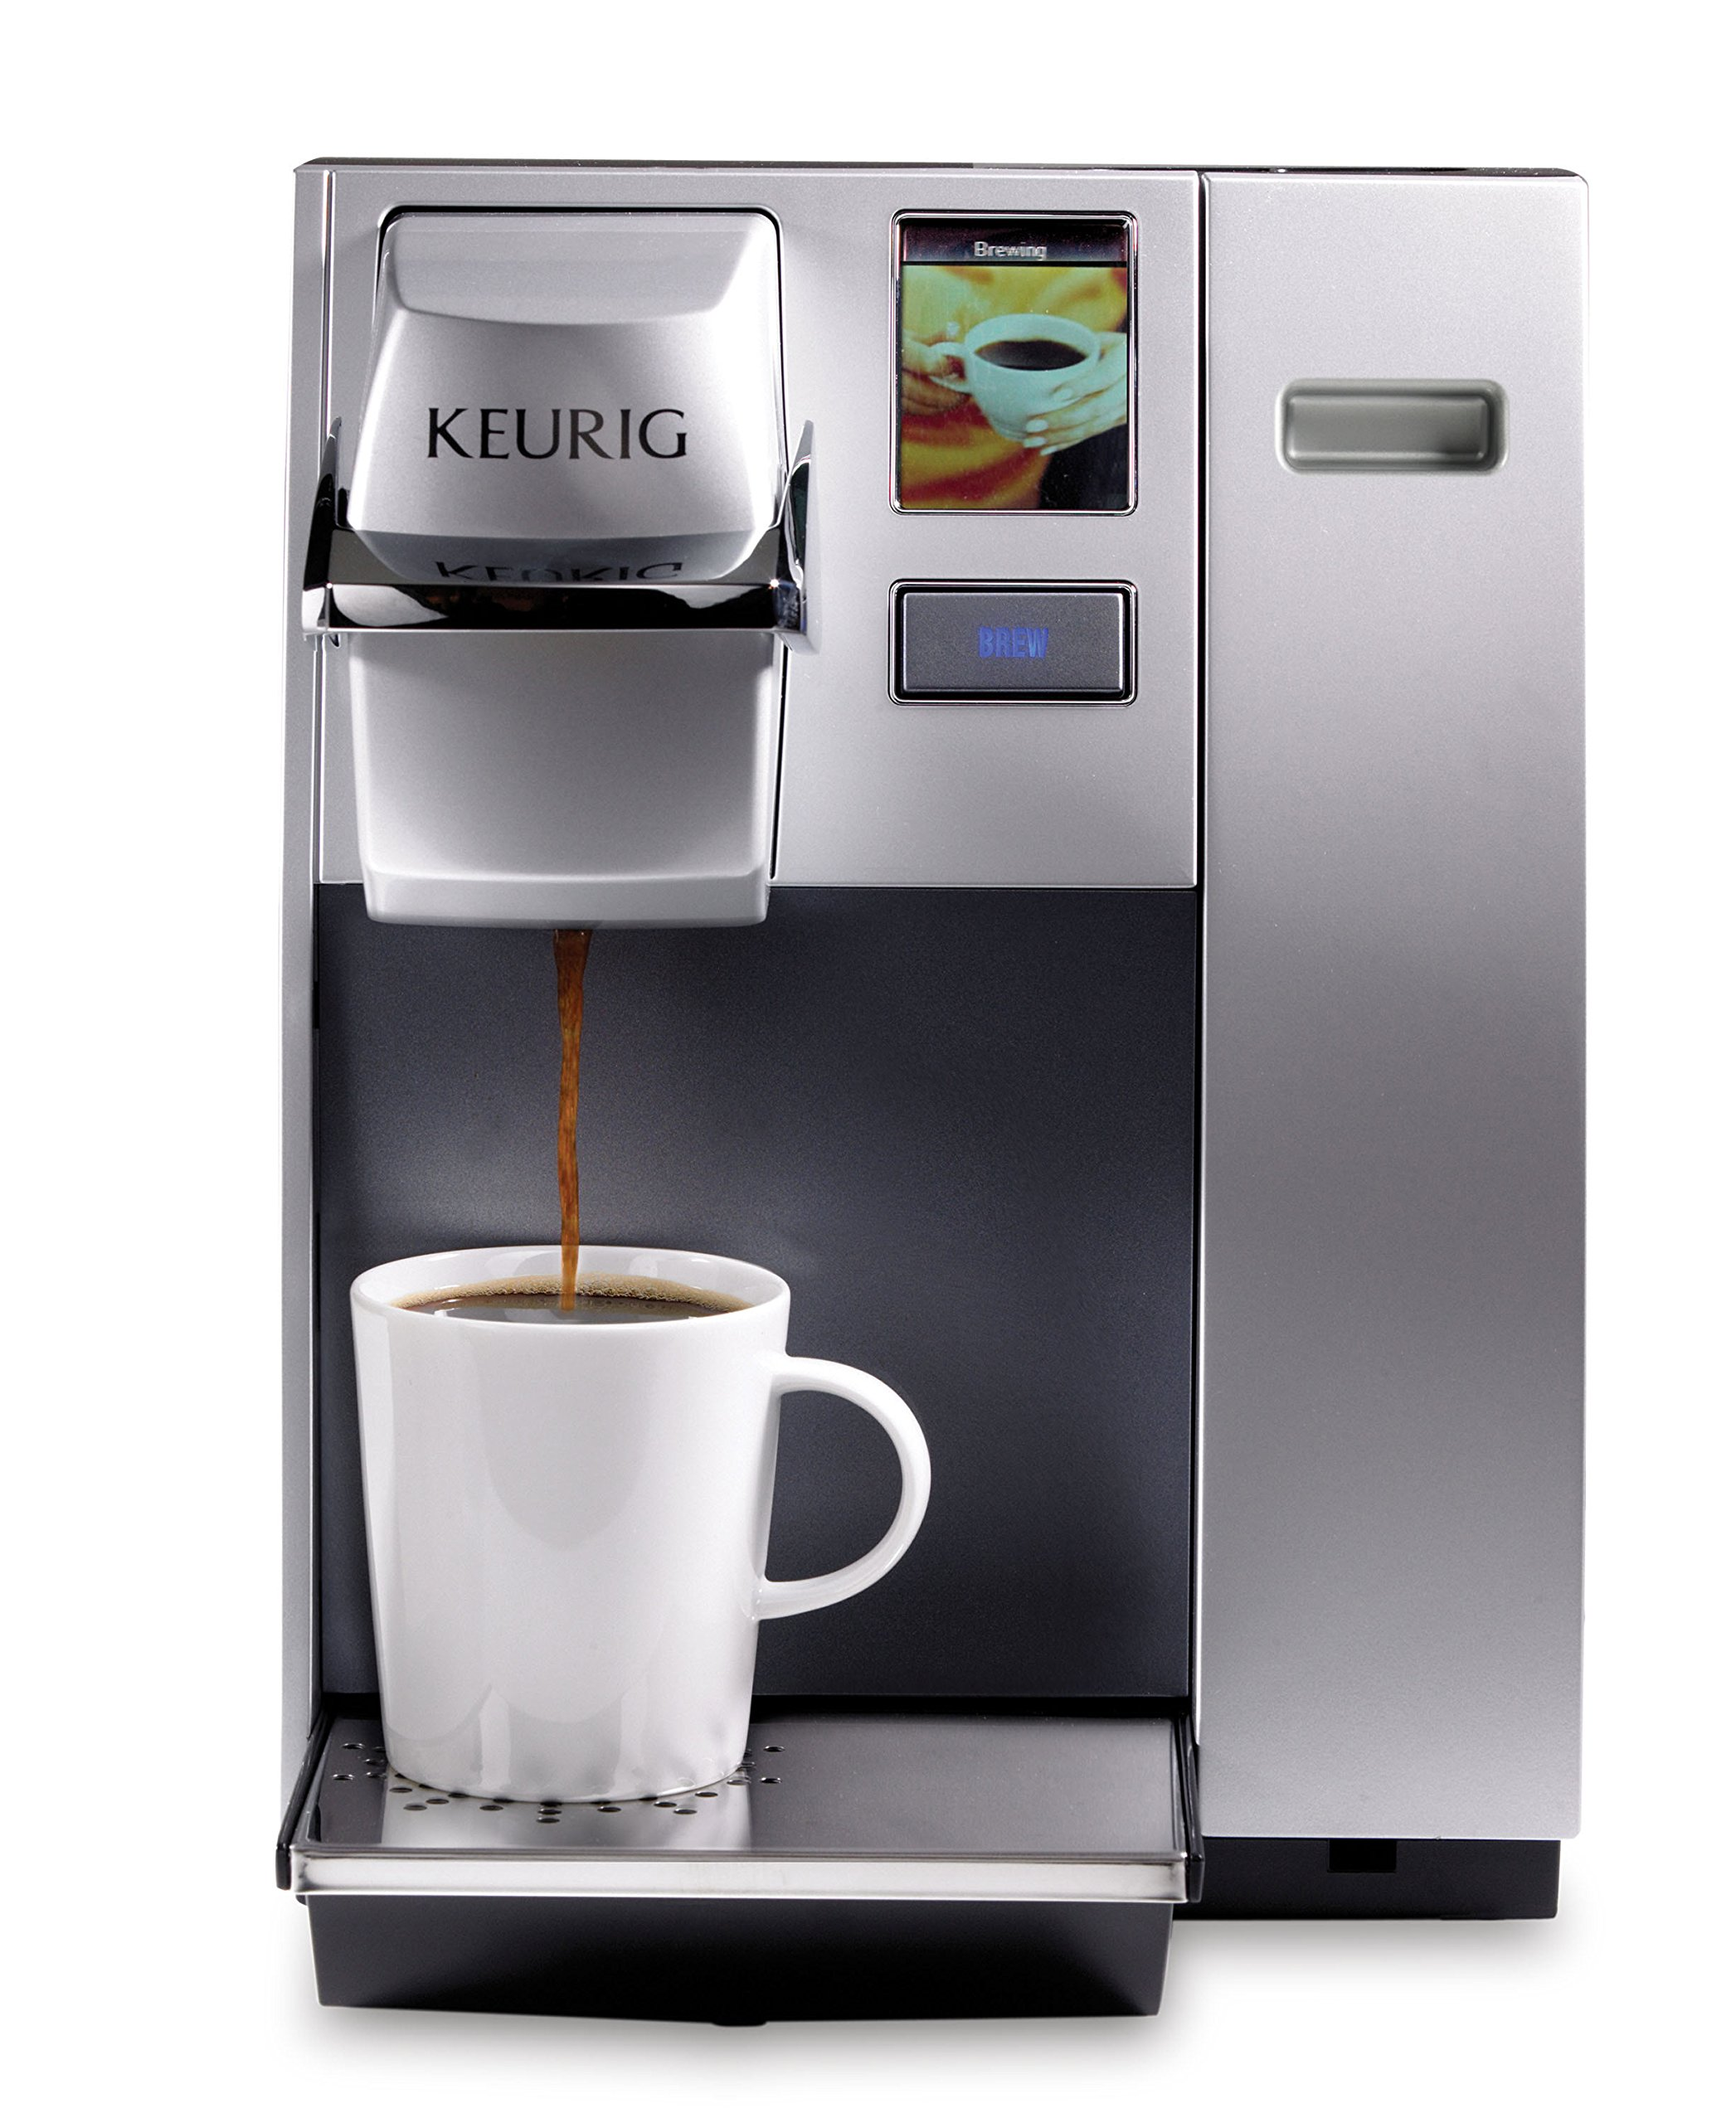 Keurig K155 Office Pro Commercial Coffee Maker, Single Serve K-Cup Pod Coffee Brewer, Silver by Keurig